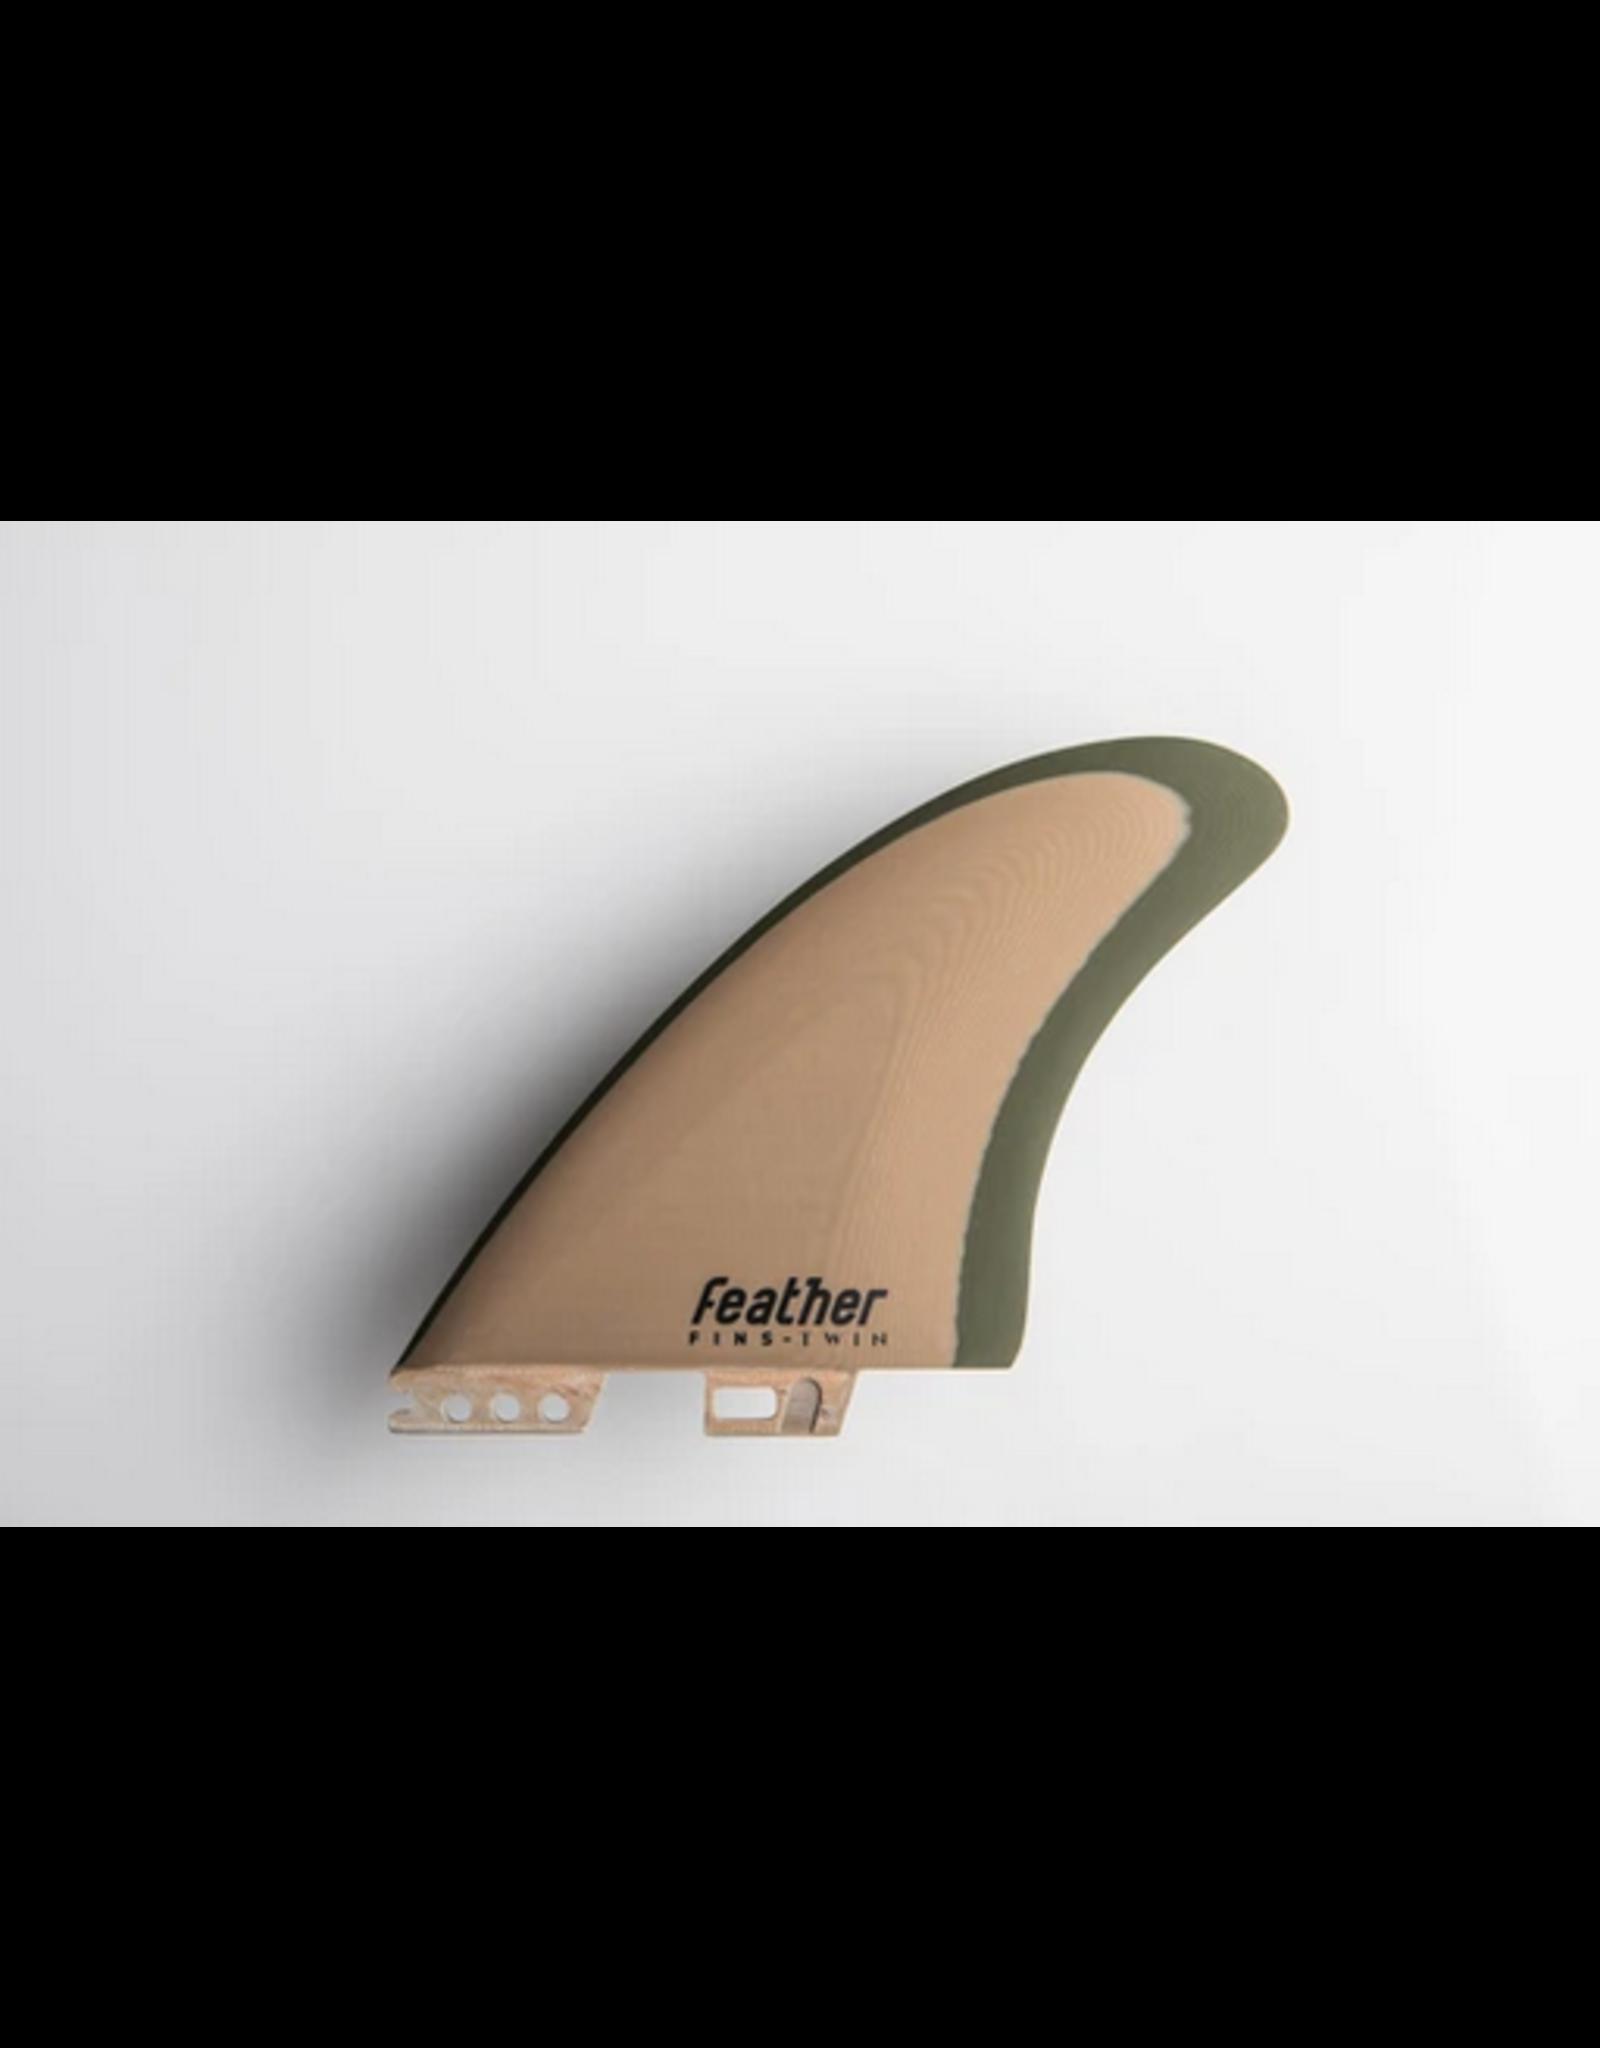 Feather Fins Feather Fins Modern Keel Twin Click Tab FSCII Green Forest